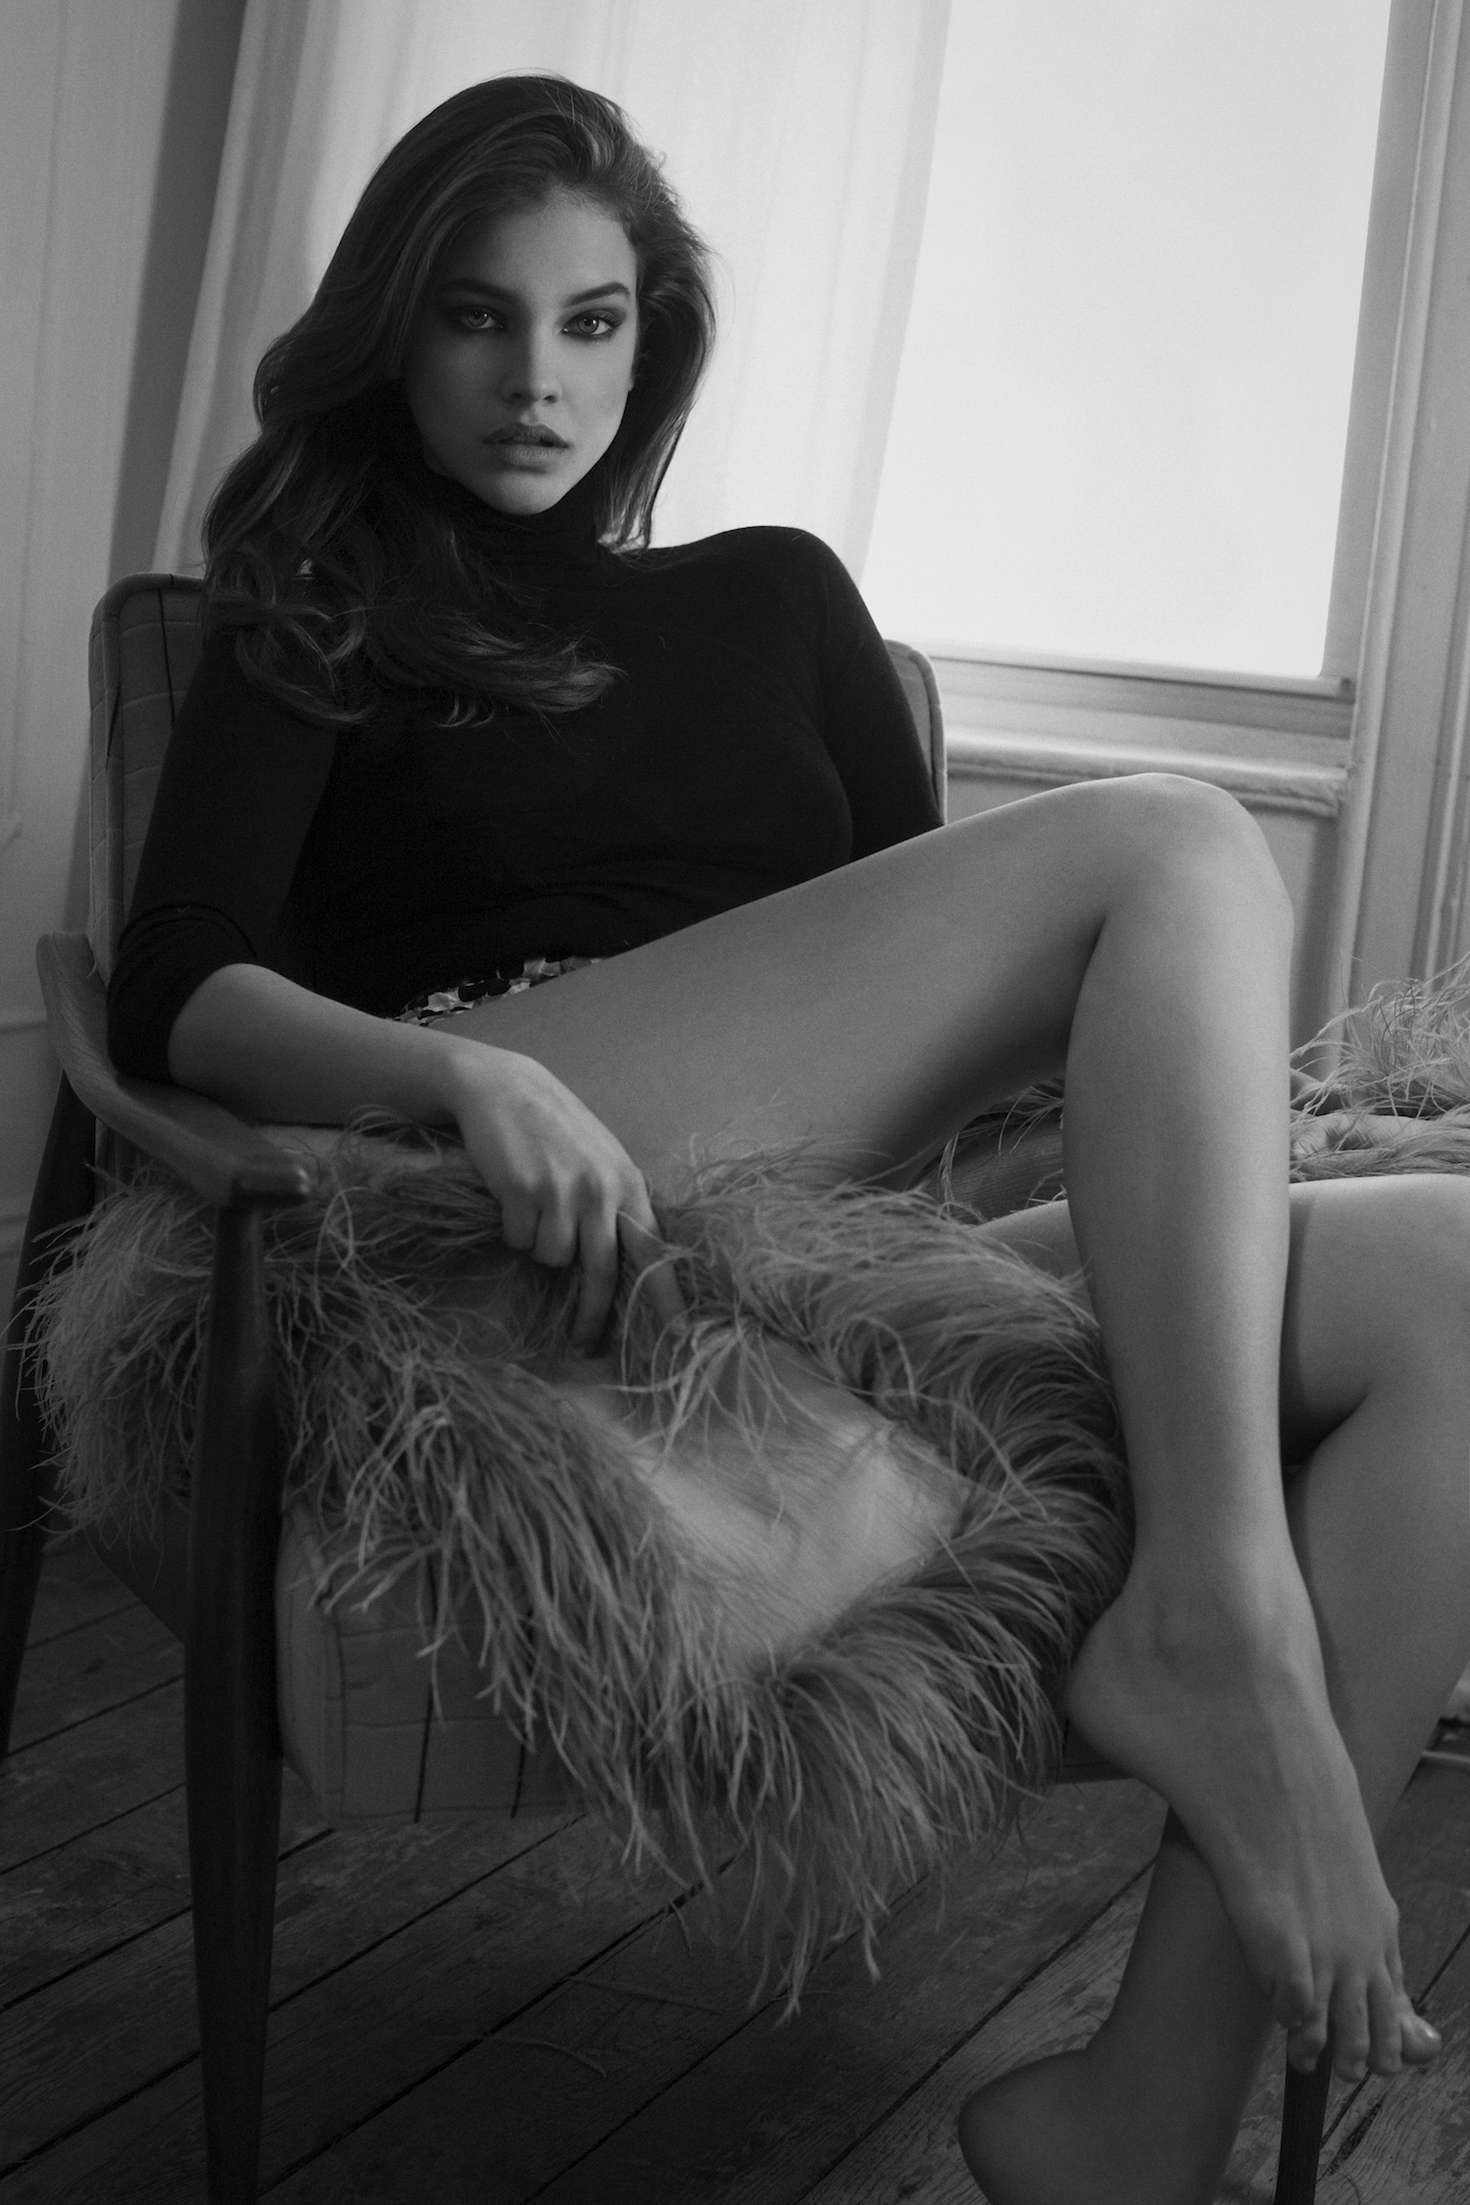 Alexandra rodriguez butt new picture